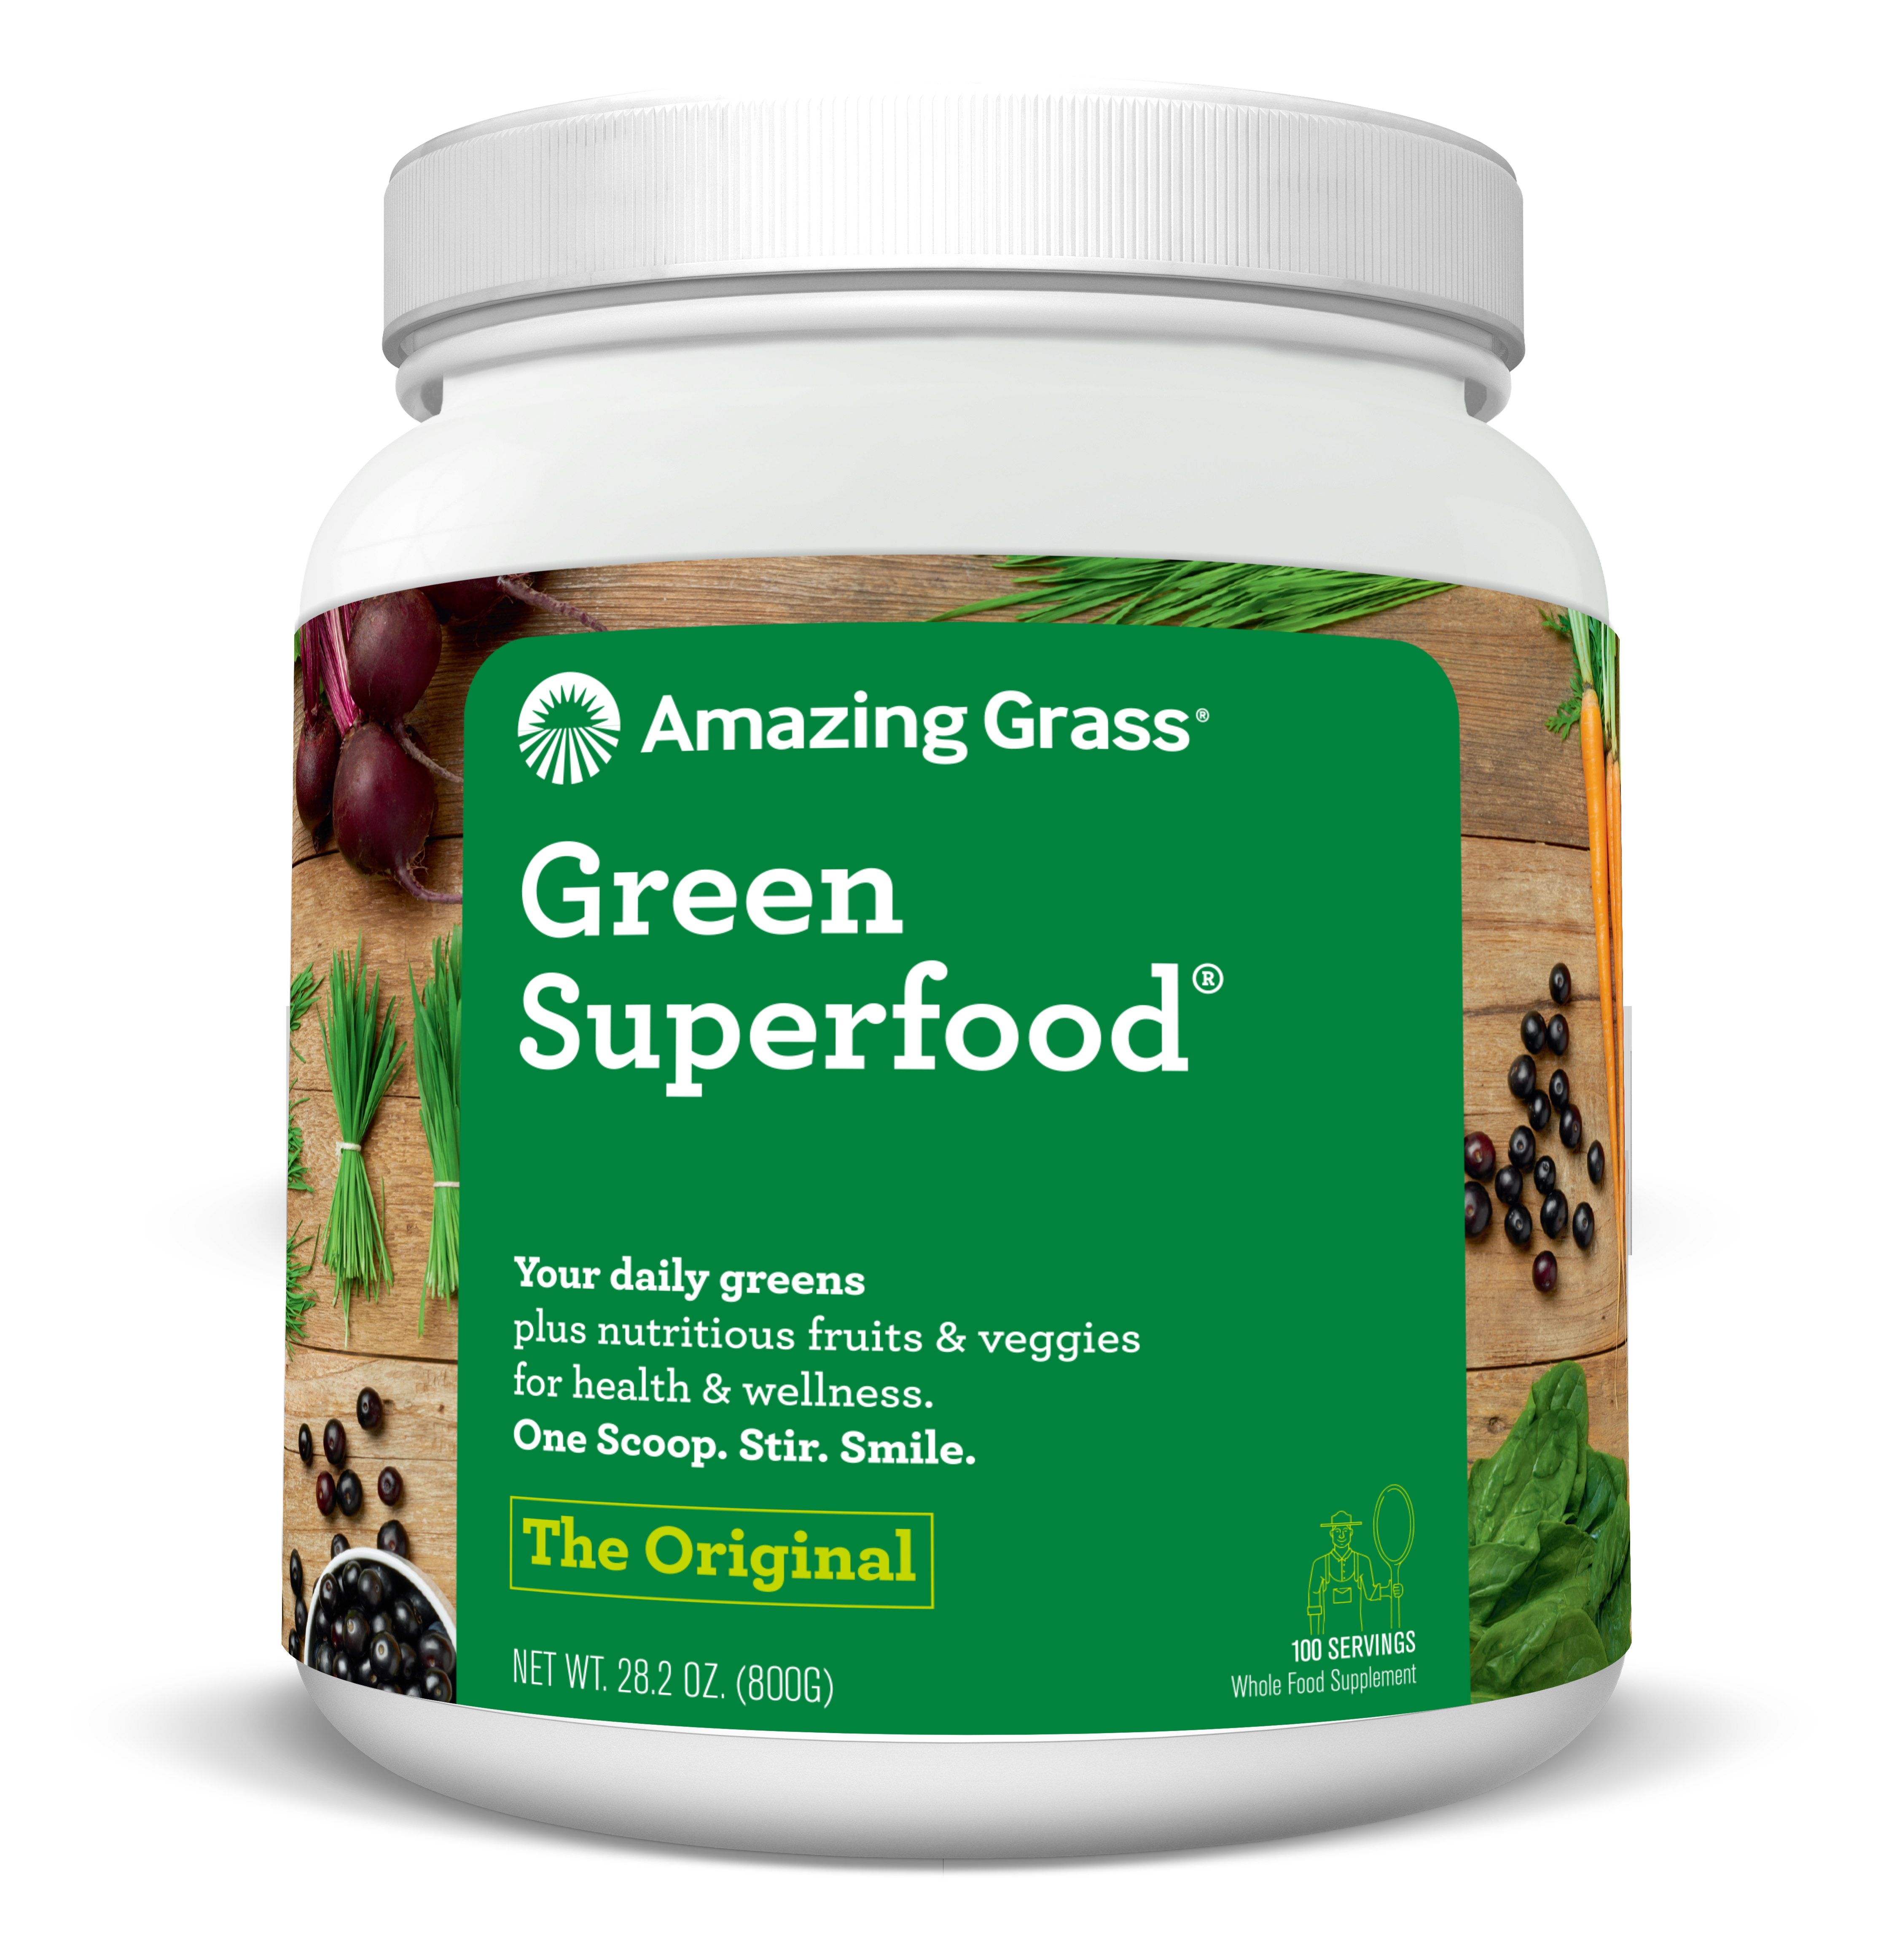 Amazing Grass Green Superfood Powder, Original, 100 Servings